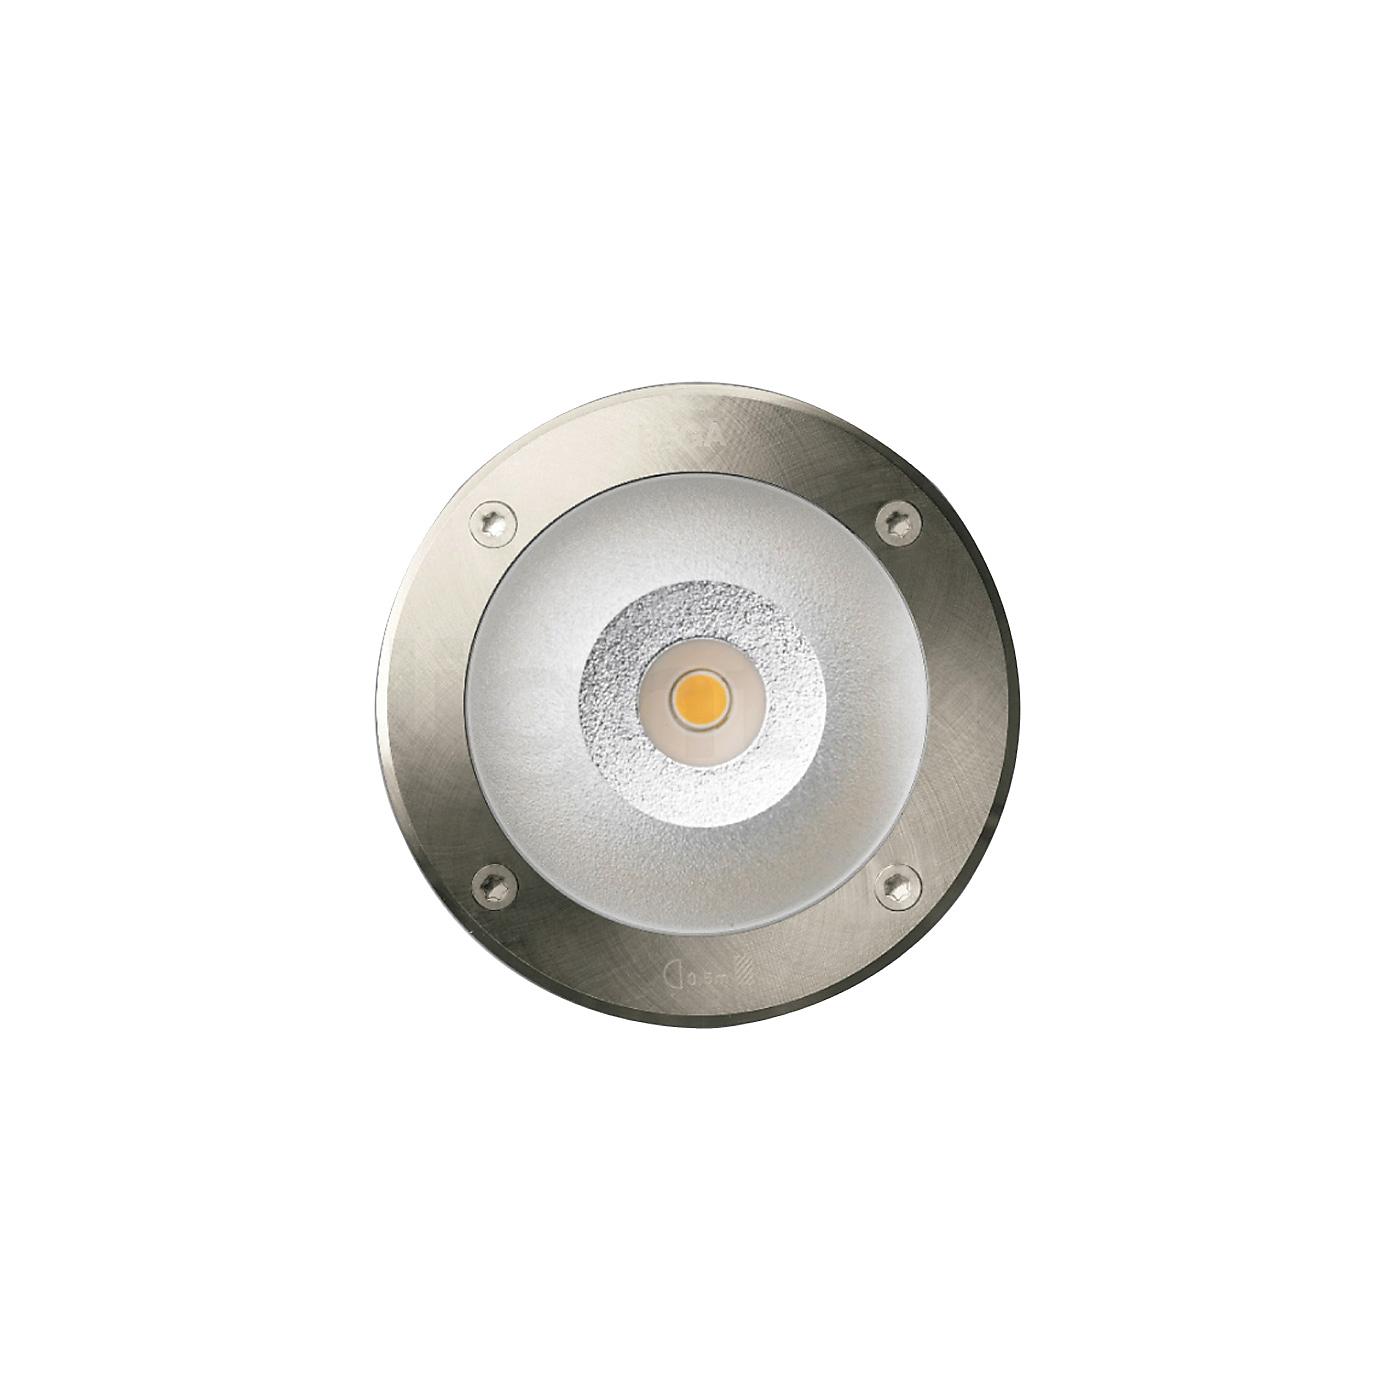 bega 77010 in ground luminaire led floor lights buy at. Black Bedroom Furniture Sets. Home Design Ideas